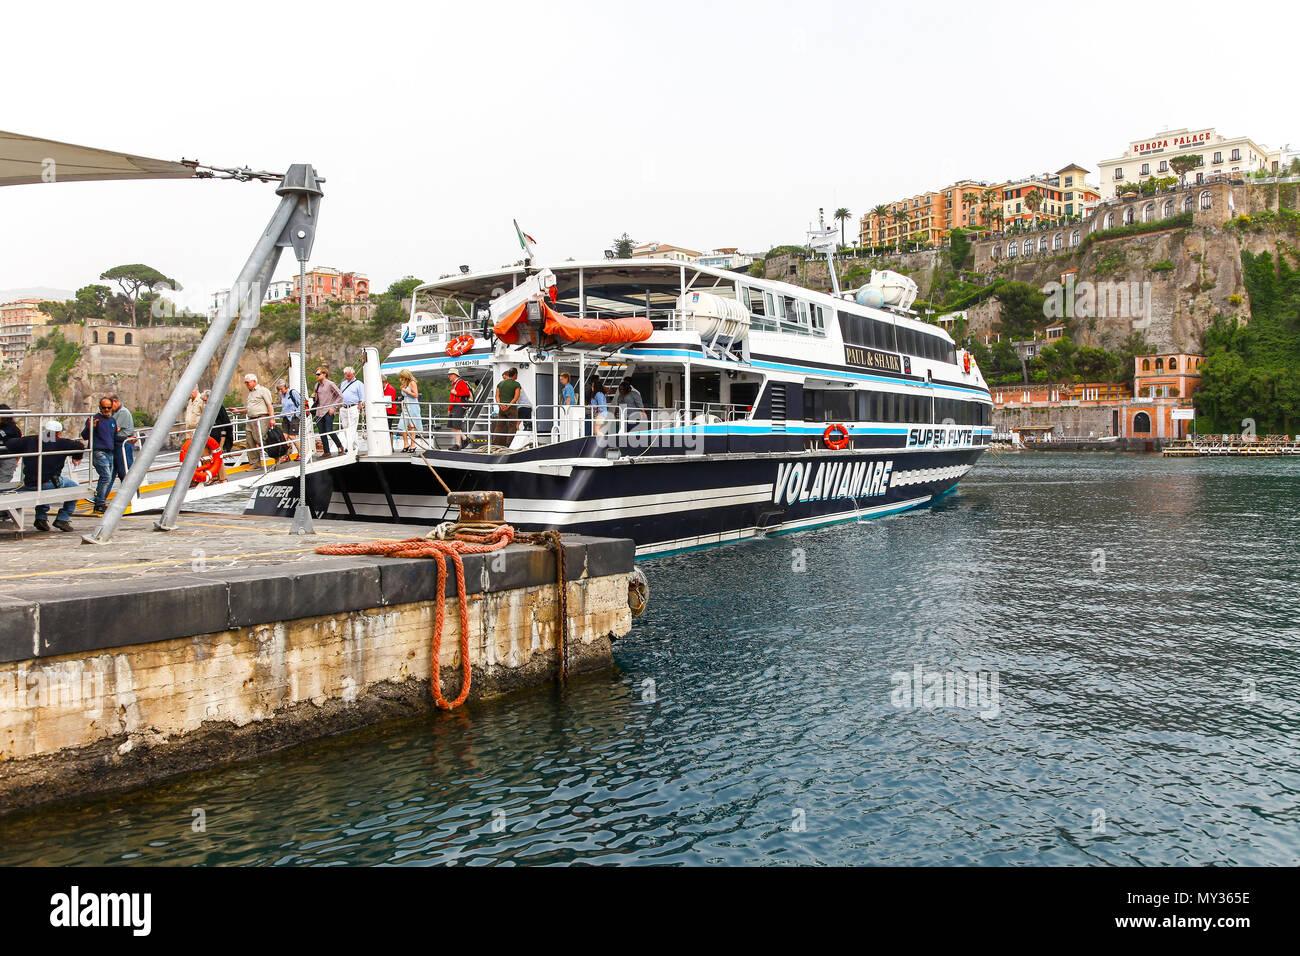 The ferry boat in The Marina Grande on the island of Capri, Campania, Italy - Stock Image